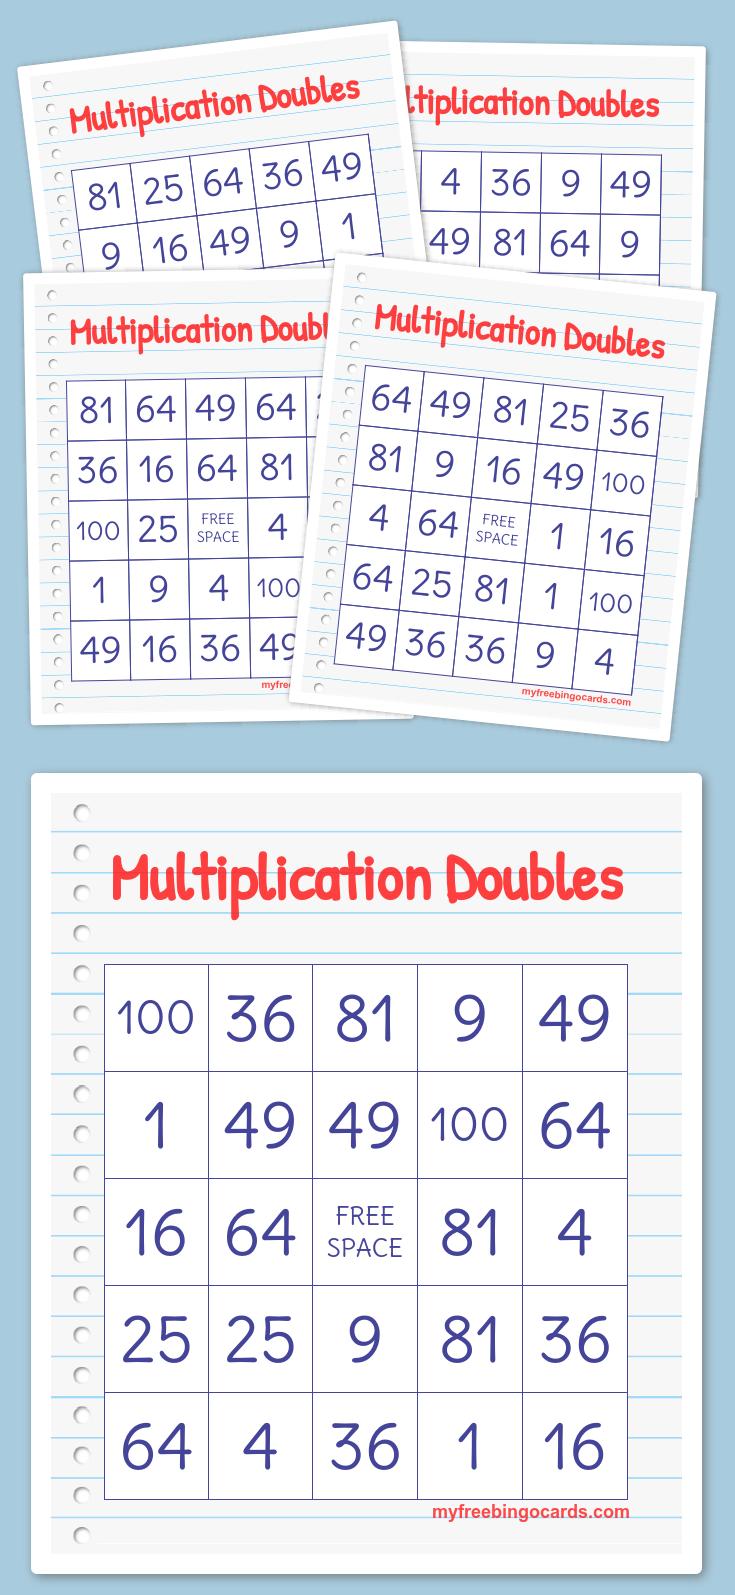 Multiplication Doubles Bingo Math Bingo Bingo Cards Printable Bingo Printable Free [ 1595 x 735 Pixel ]